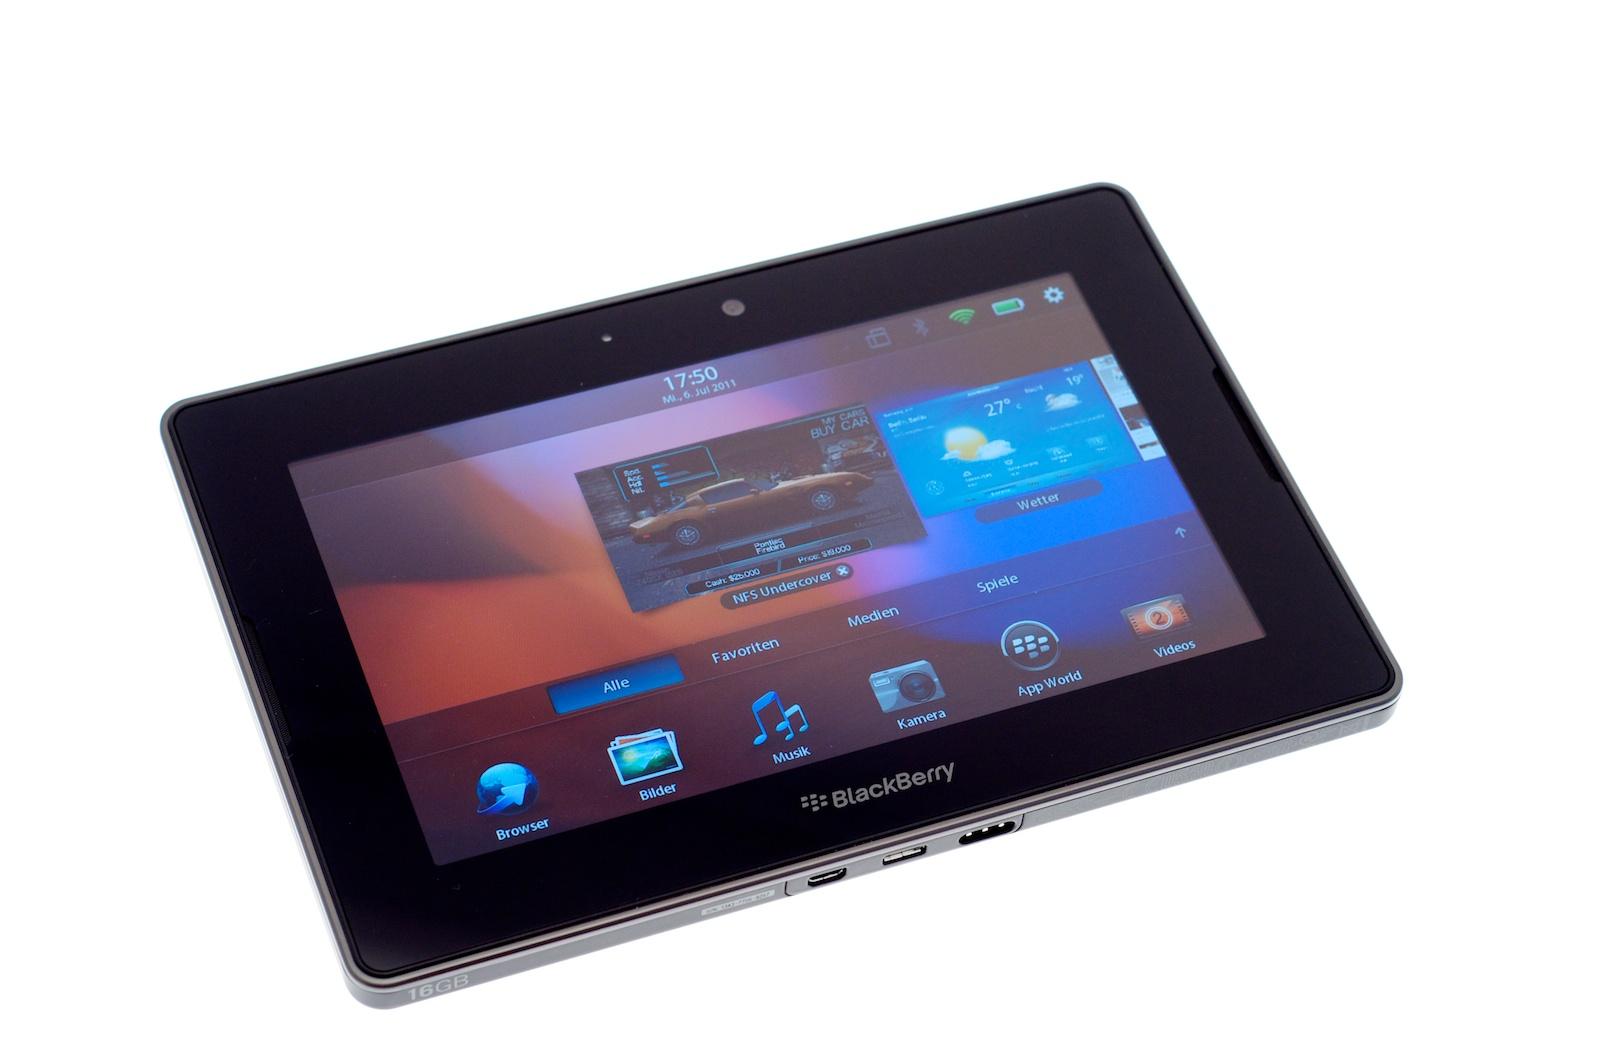 Blackberry Playbook im Test: Kompaktes Tablet mit intuitiven Gesten - Blickwinkelstabiles und helles Display (Bild: Andreas Sebayang)